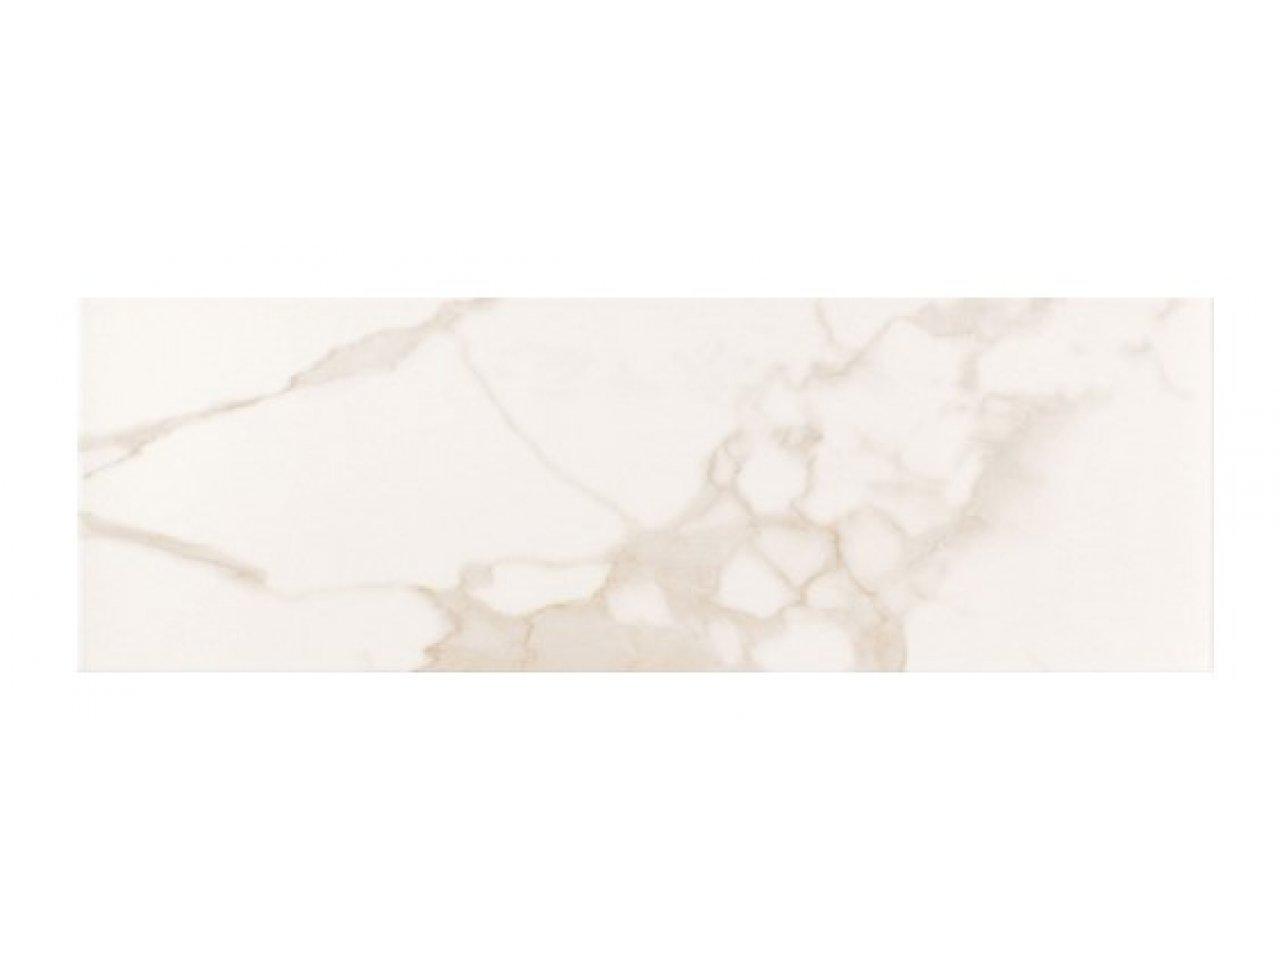 Настенная плитка FAP Roma Diamond Calacatta Brillante 75 x 25 см, Арт. fNDV